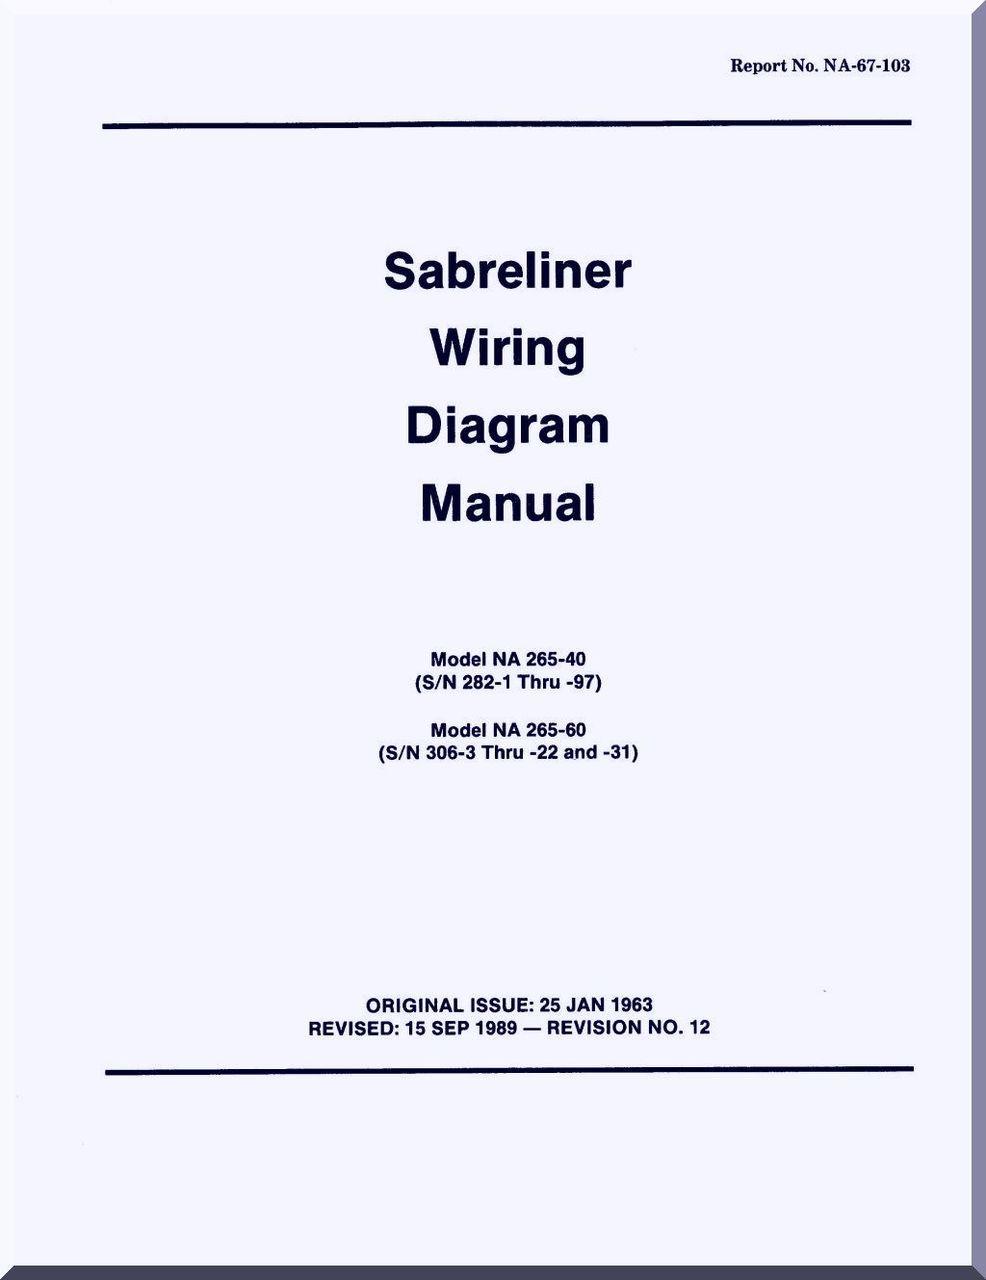 [SCHEMATICS_48IU]  Sabreliner NA 265 -40 -60 Aircraft Wiring Diagram Manual - Report No.  NA-67-103 - 1963 - Aircraft Reports - Aircraft Manuals - Aircraft  Helicopter Engines Propellers Blueprints Publications   Canadair Aircraft Wiring Diagram      Aircraft Reports